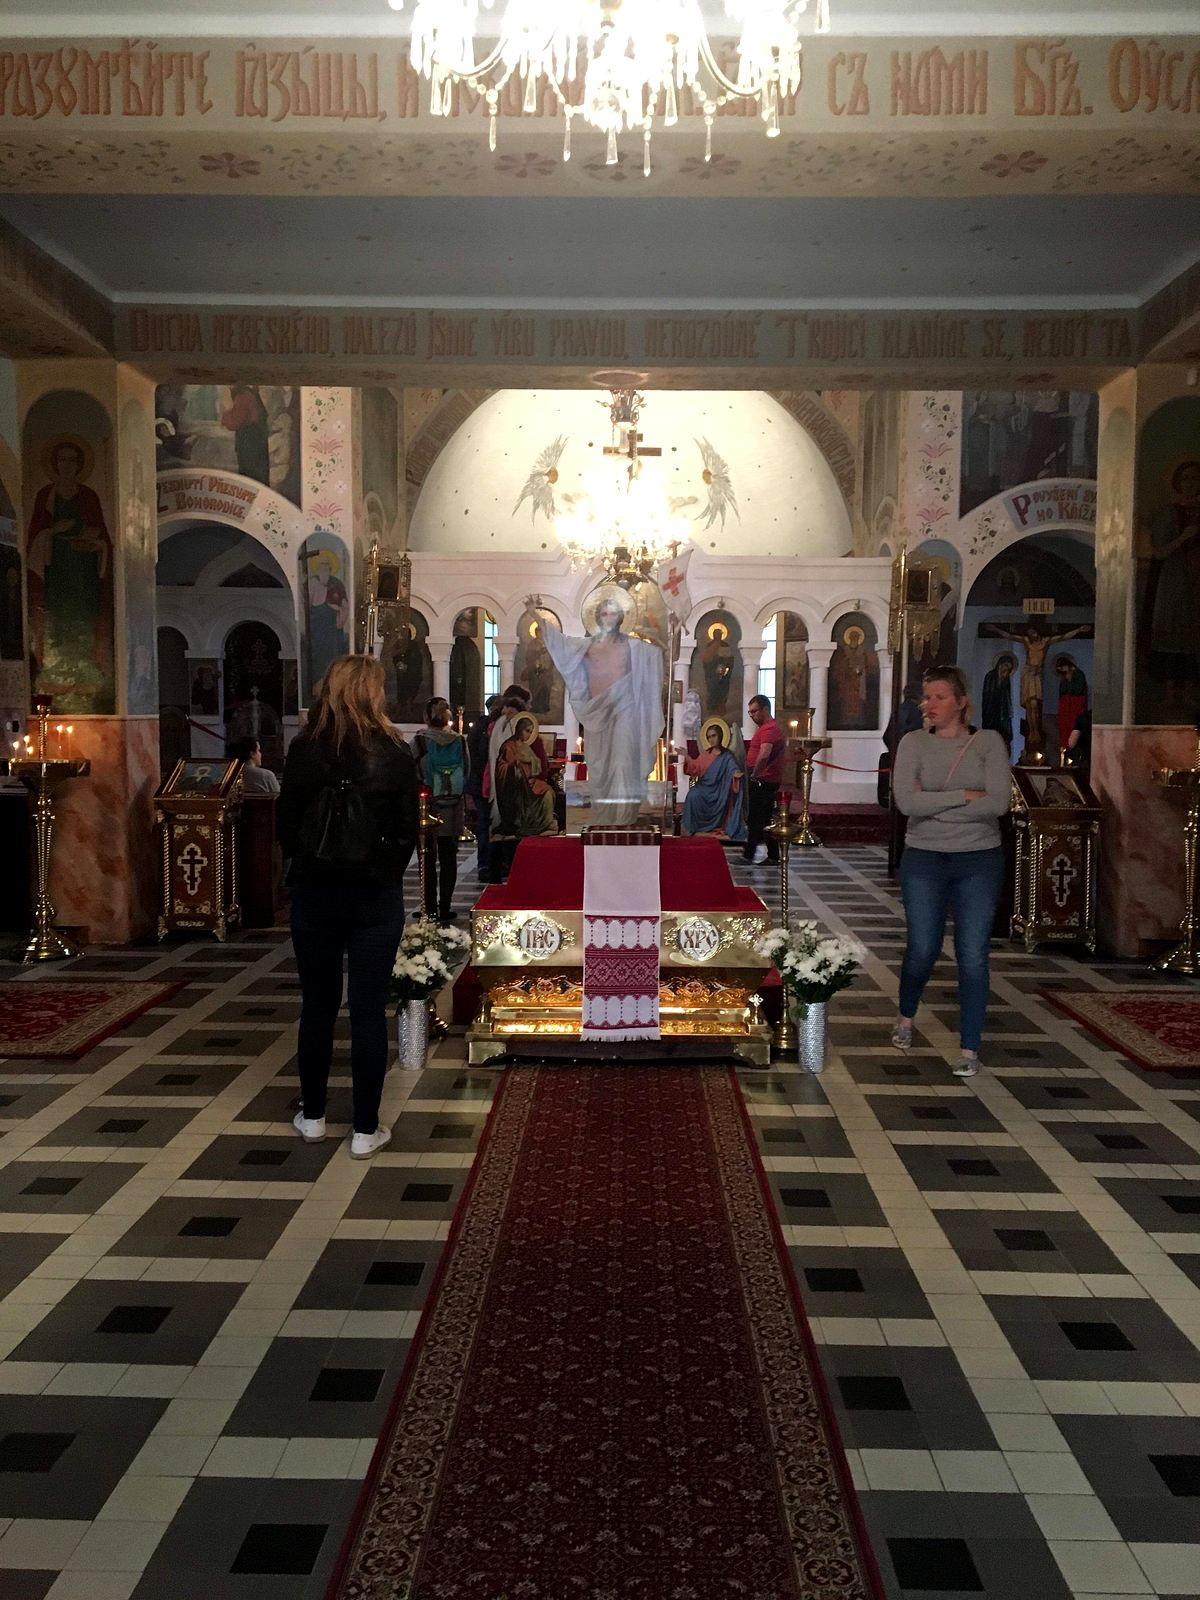 2019-06-olomouc-noc-kostelu-IMG_0376_1